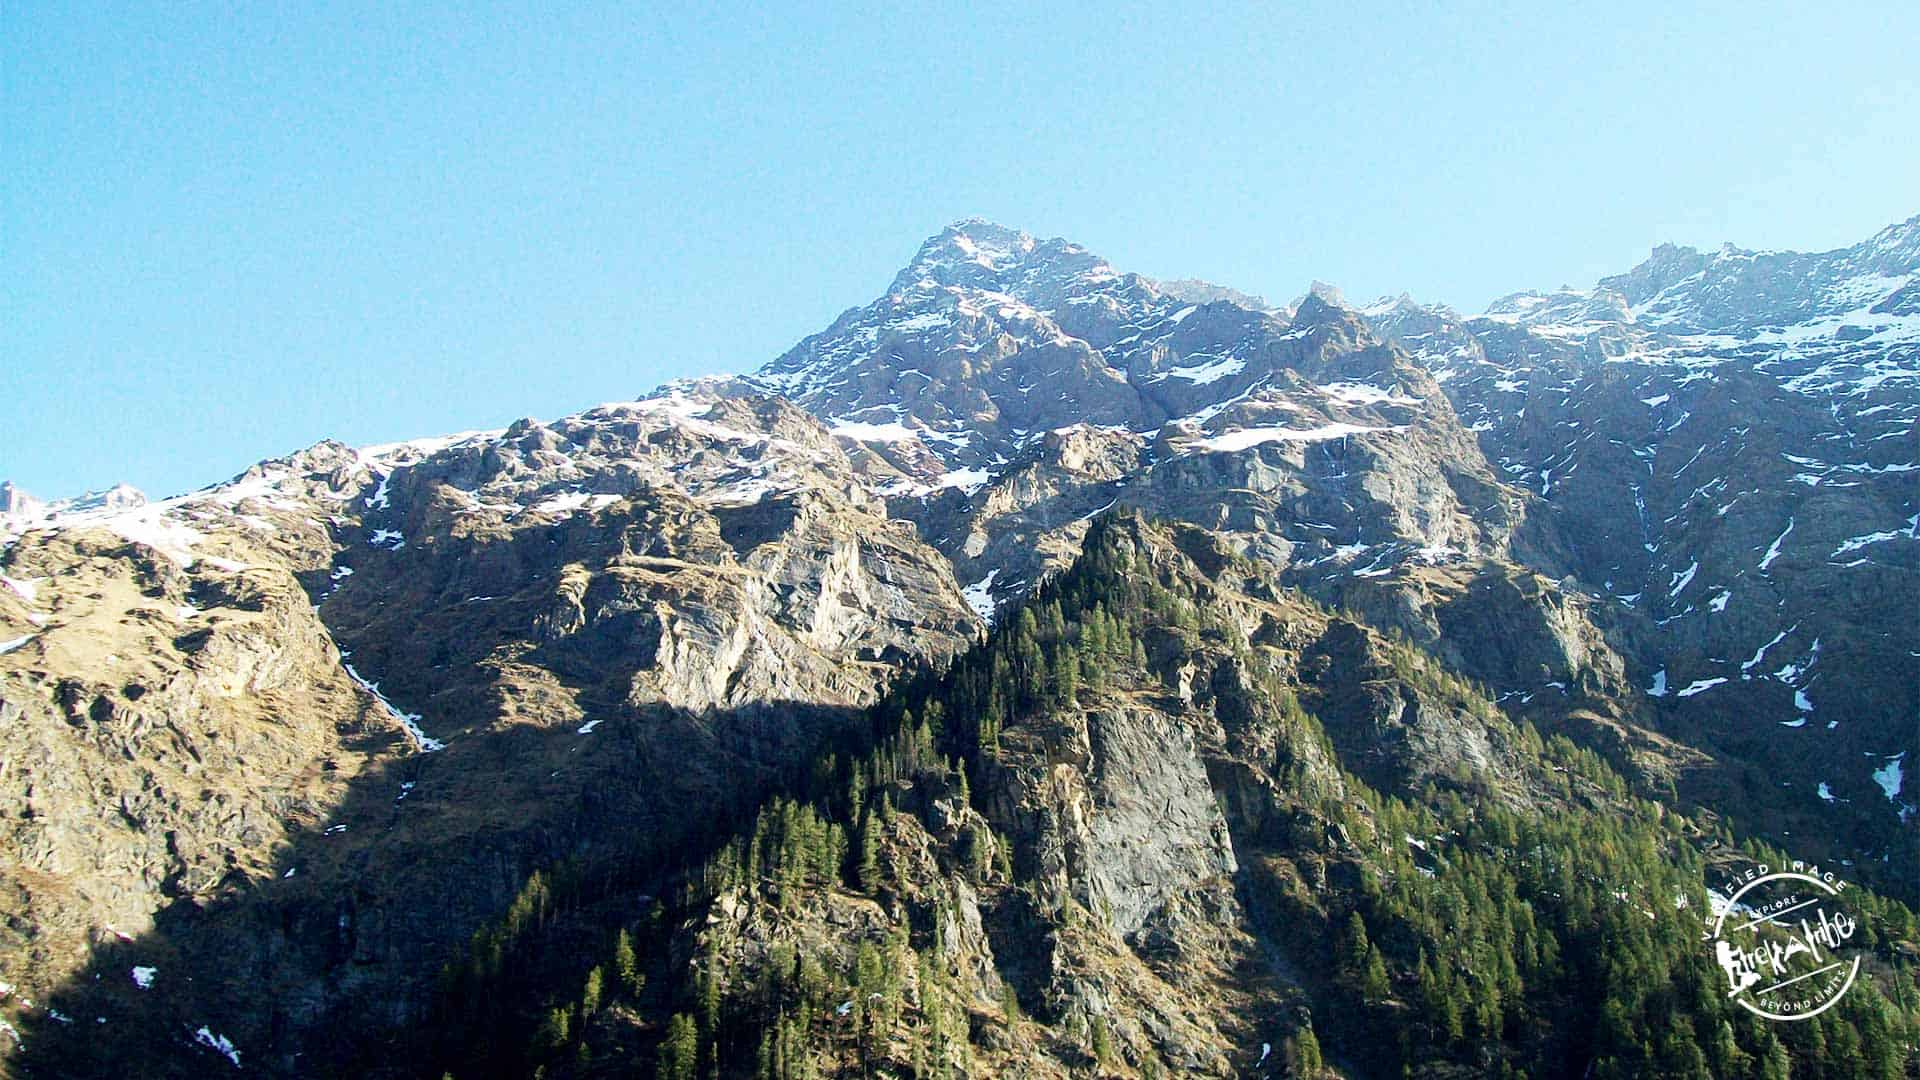 snow covered peaks above Kheerganga hot spring